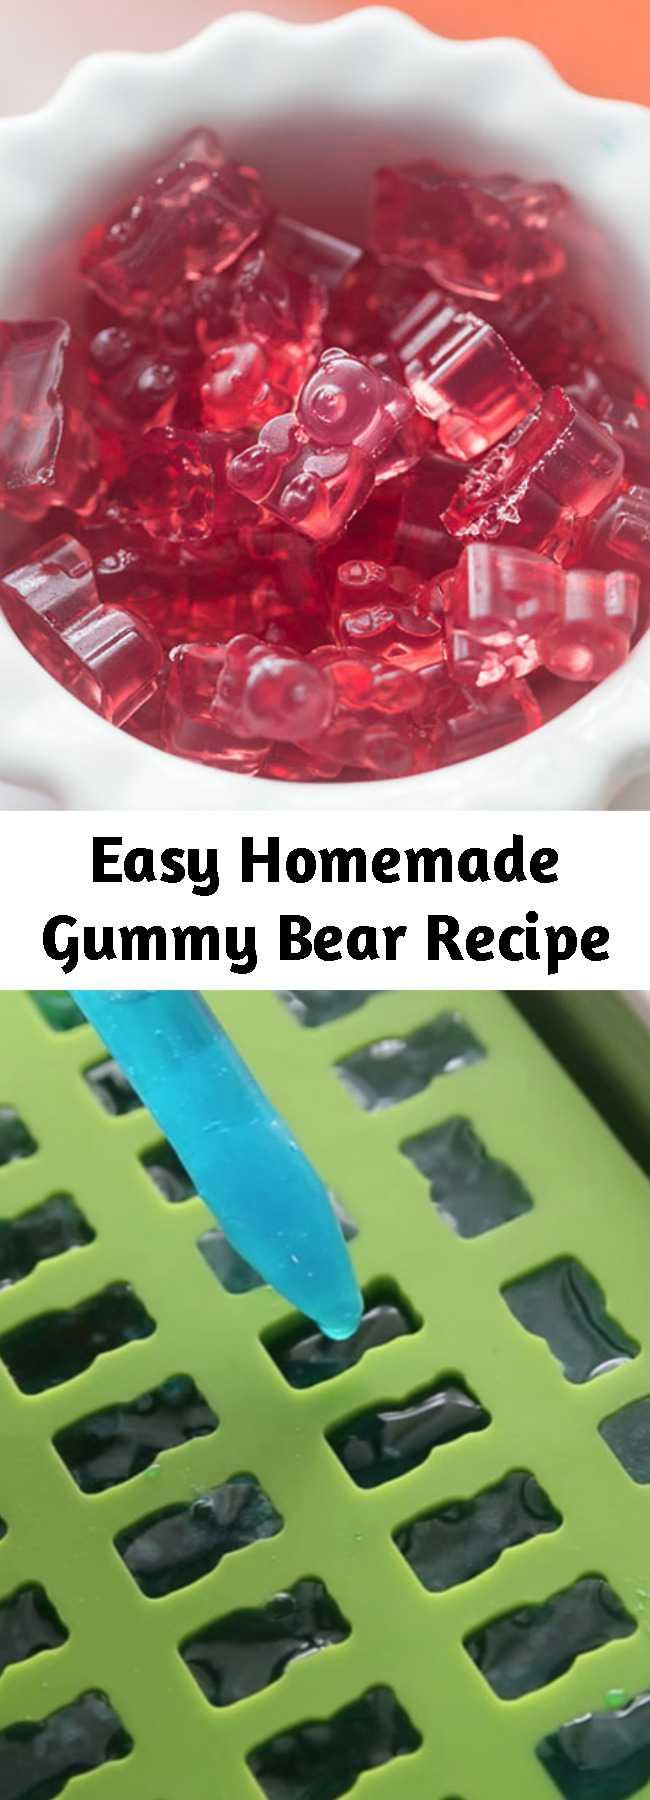 Easy Homemade Gummy Bear Recipe - This homemade gummy bear recipe is so easy to make! Kids will love helping to make their own gummy bear treats. 2 ways to make them: Gummy Bear Recipe with Jello and Gummy Bear Recipe with Gelatin and Real Fruit Juice #recipes #kidsrecipes #snacks #treats